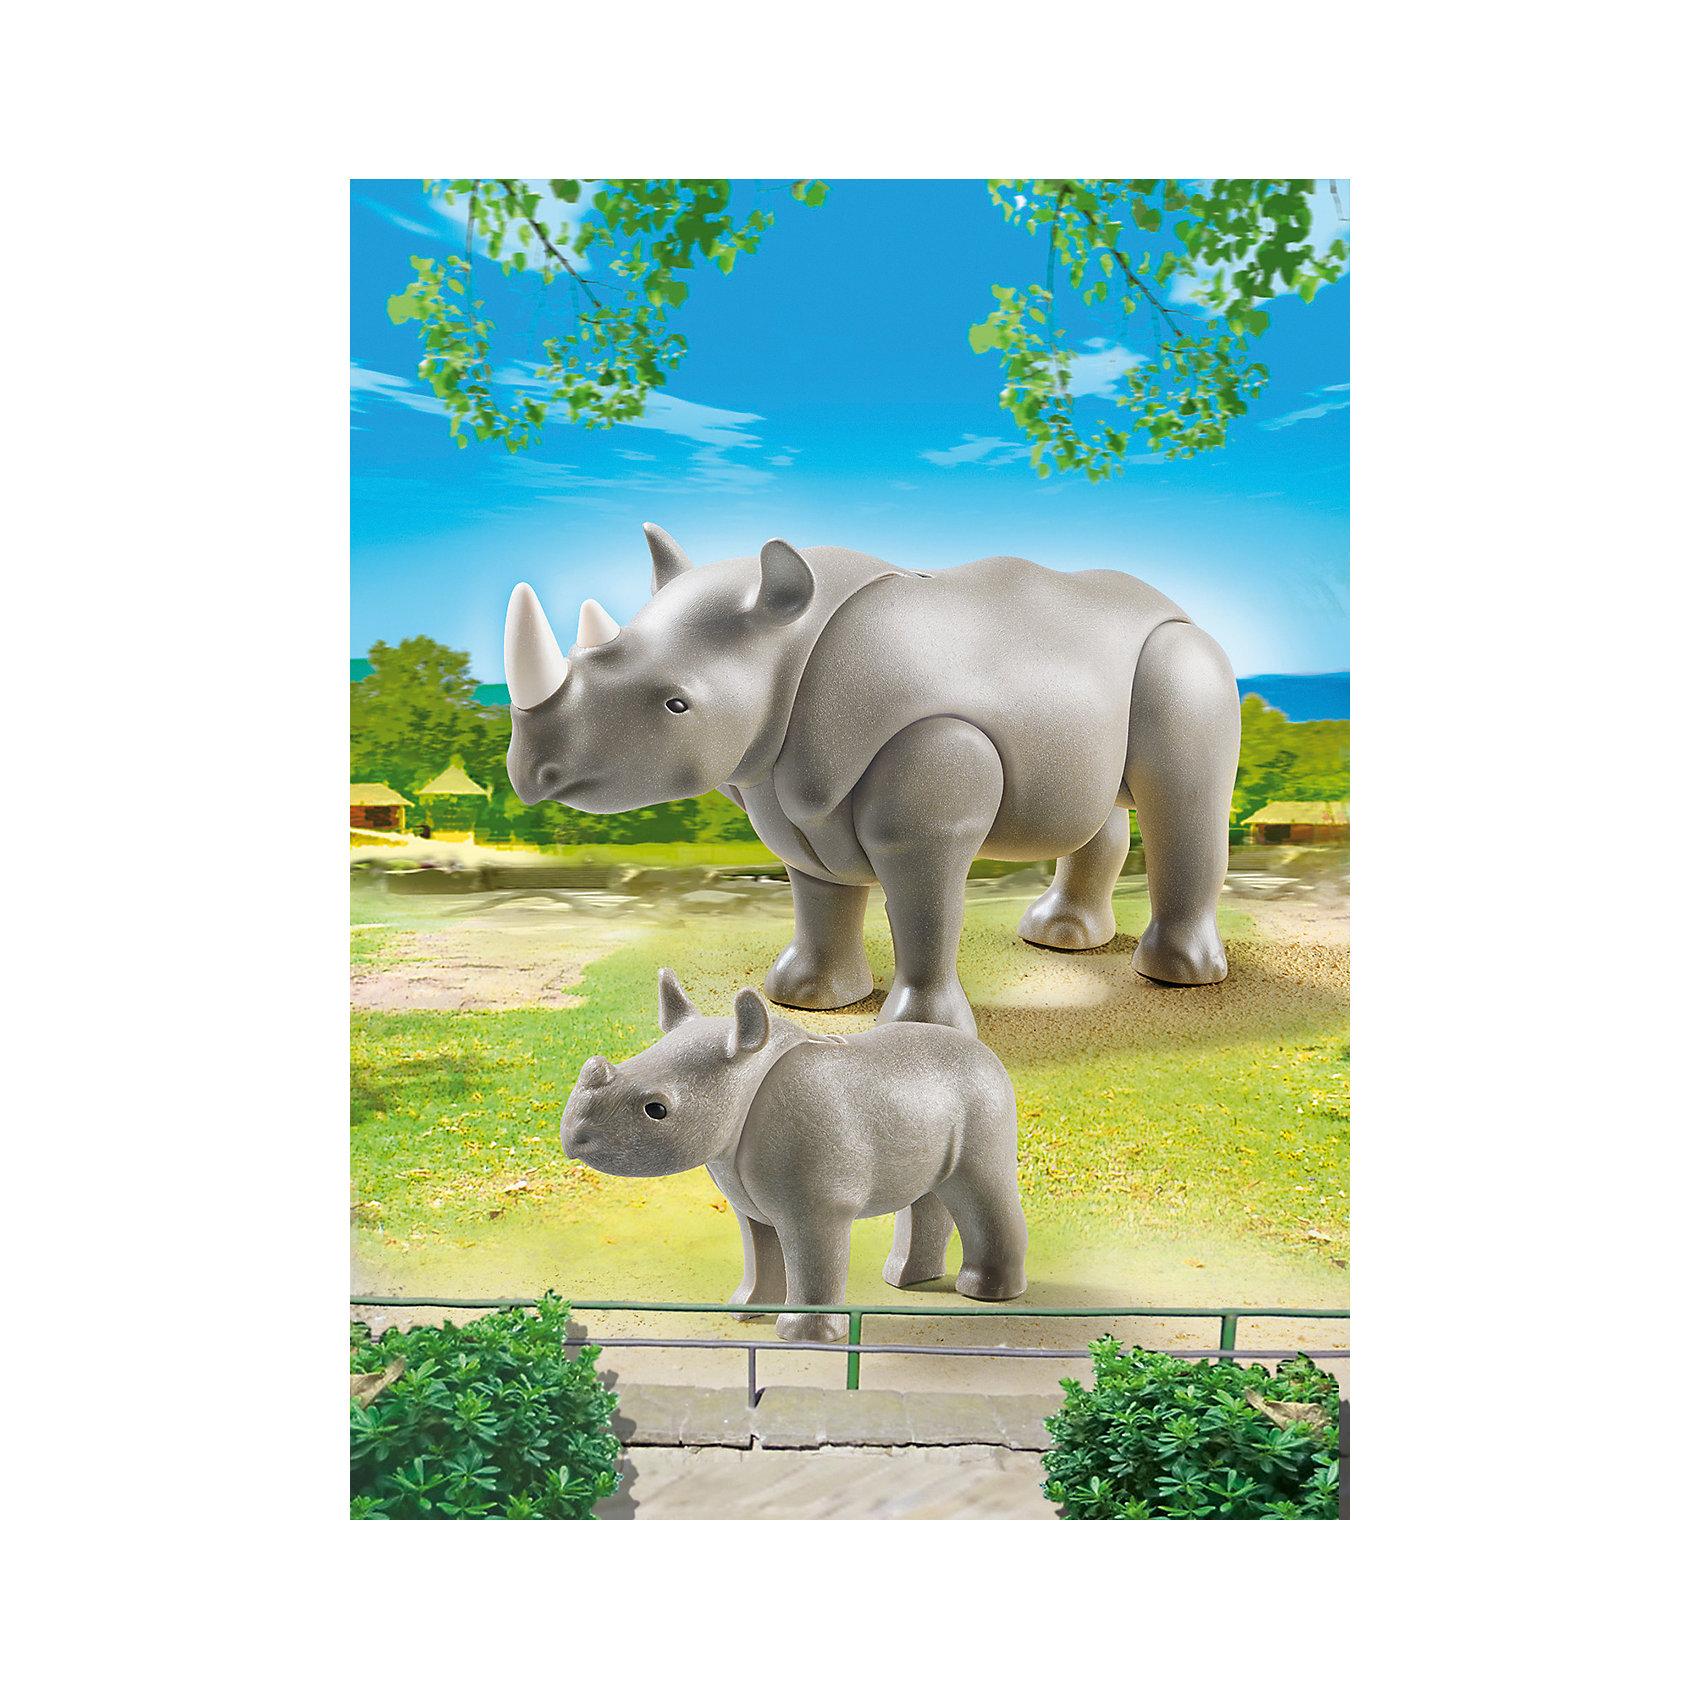 PLAYMOBIL® Зоопарк: Носорог с носорожком, PLAYMOBIL playmobil® в поисках приключений семья рысей с кинооператором playmobil